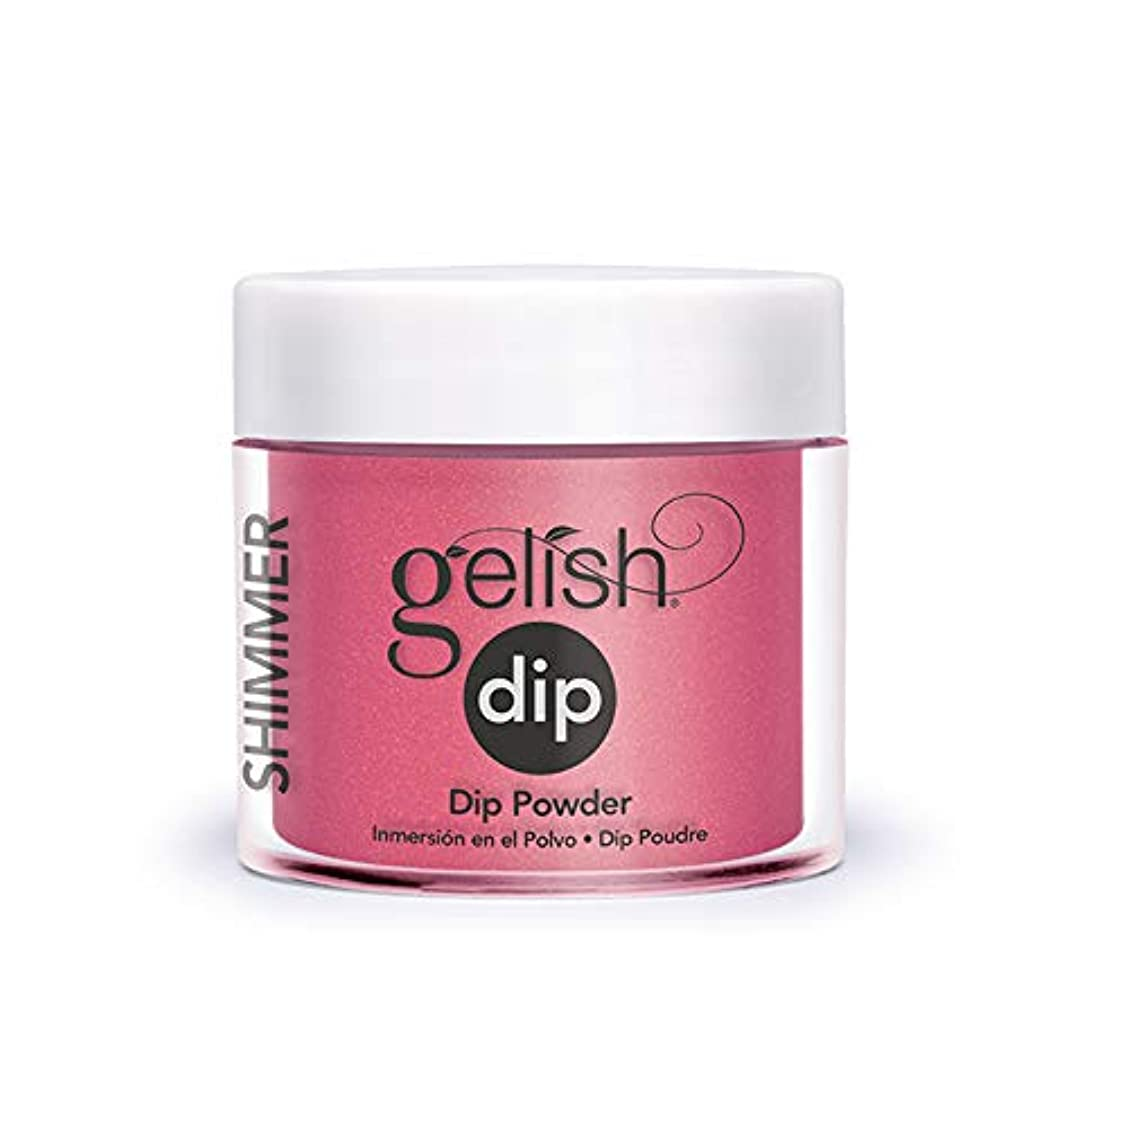 Harmony Gelish - Acrylic Dip Powder - My Kind of Ball Gown - 23g / 0.8oz